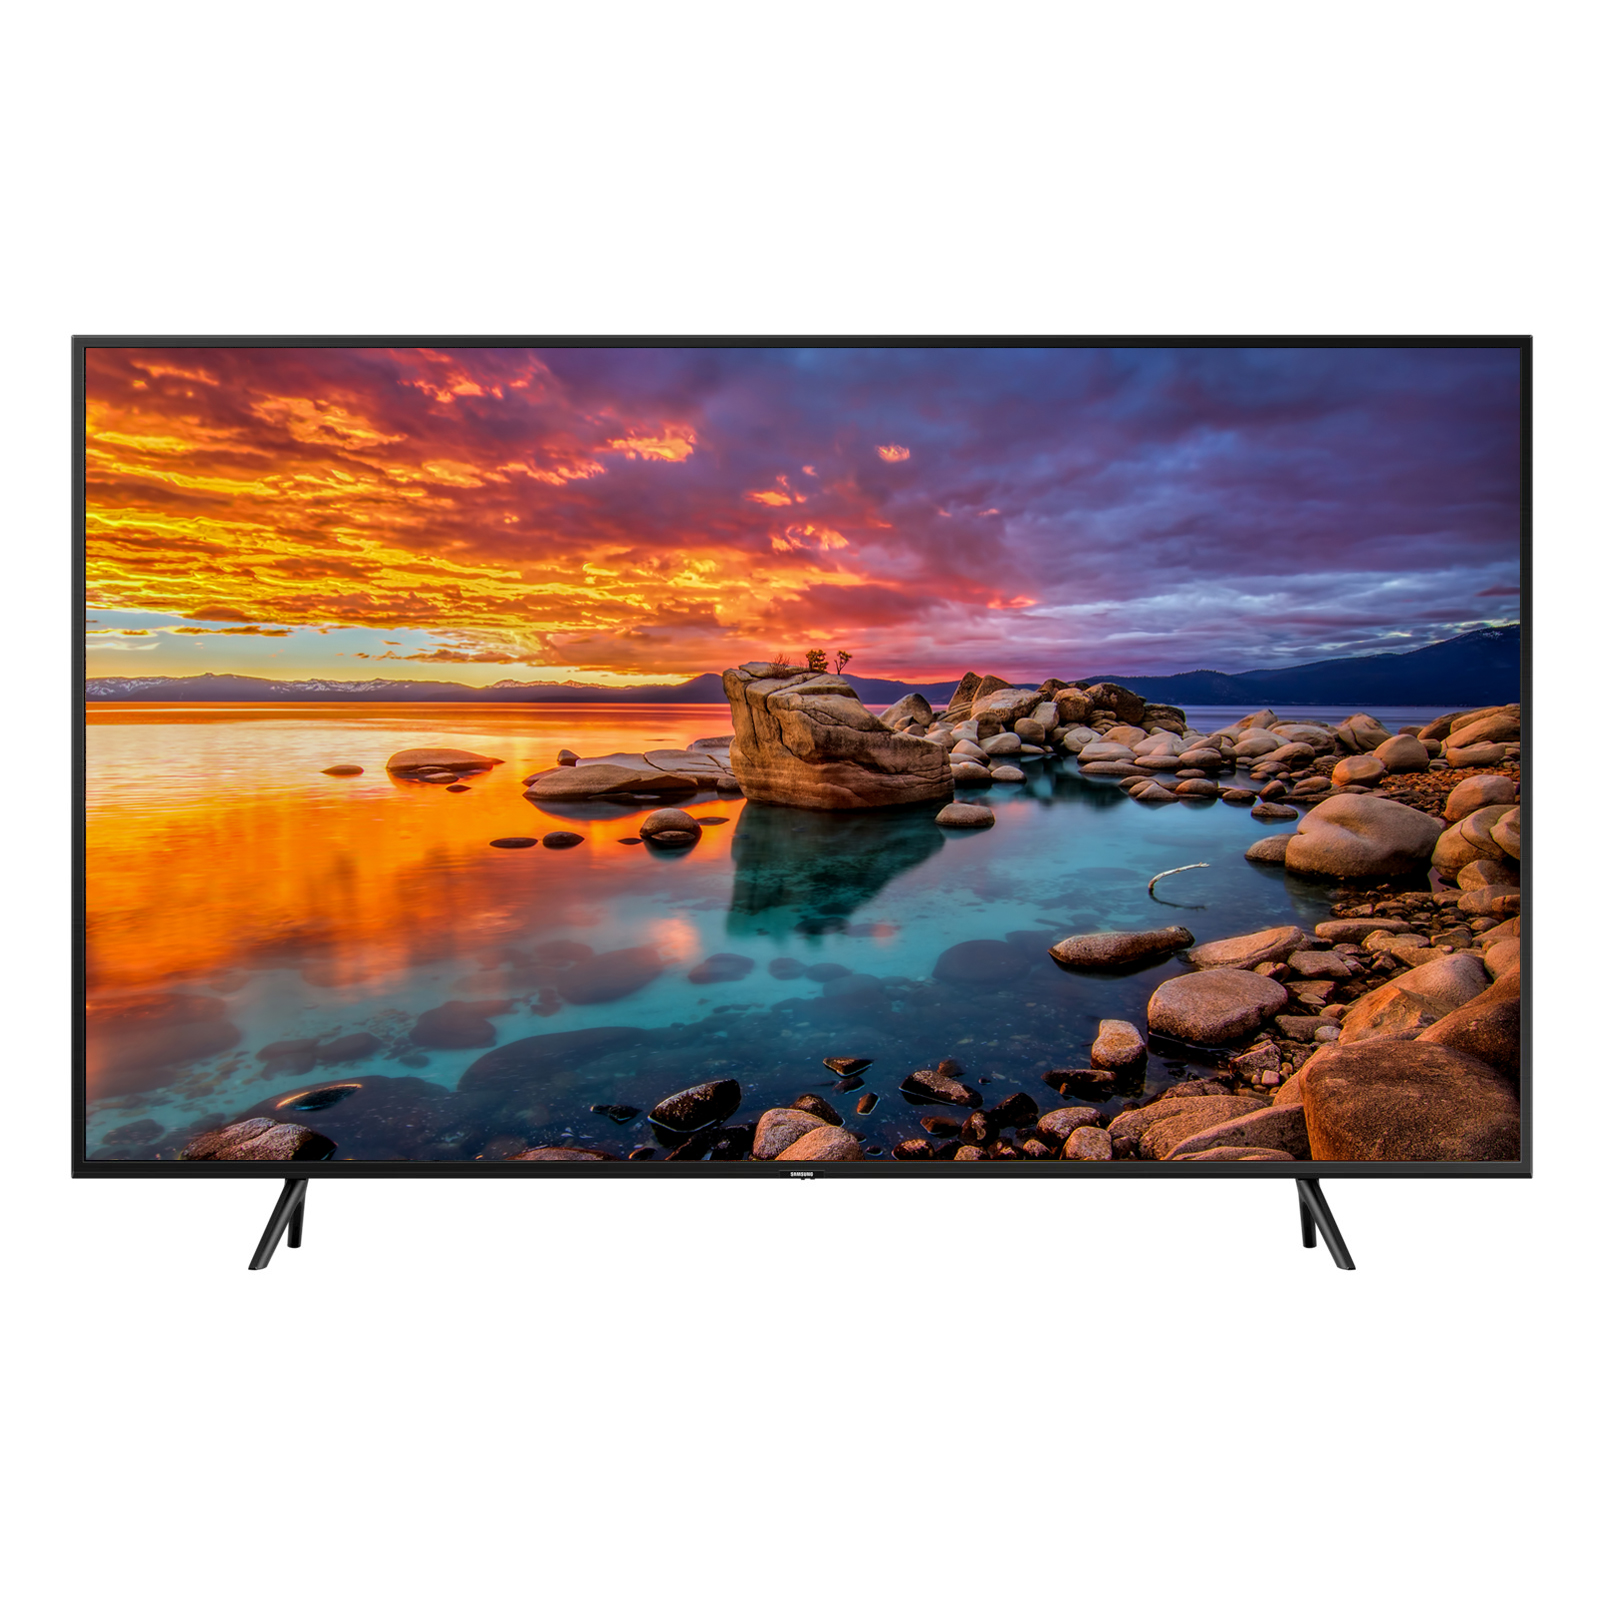 Samsung 55Q60R 55 Zoll (132cm) UHD 4K 3000PQI QLED Smart TV